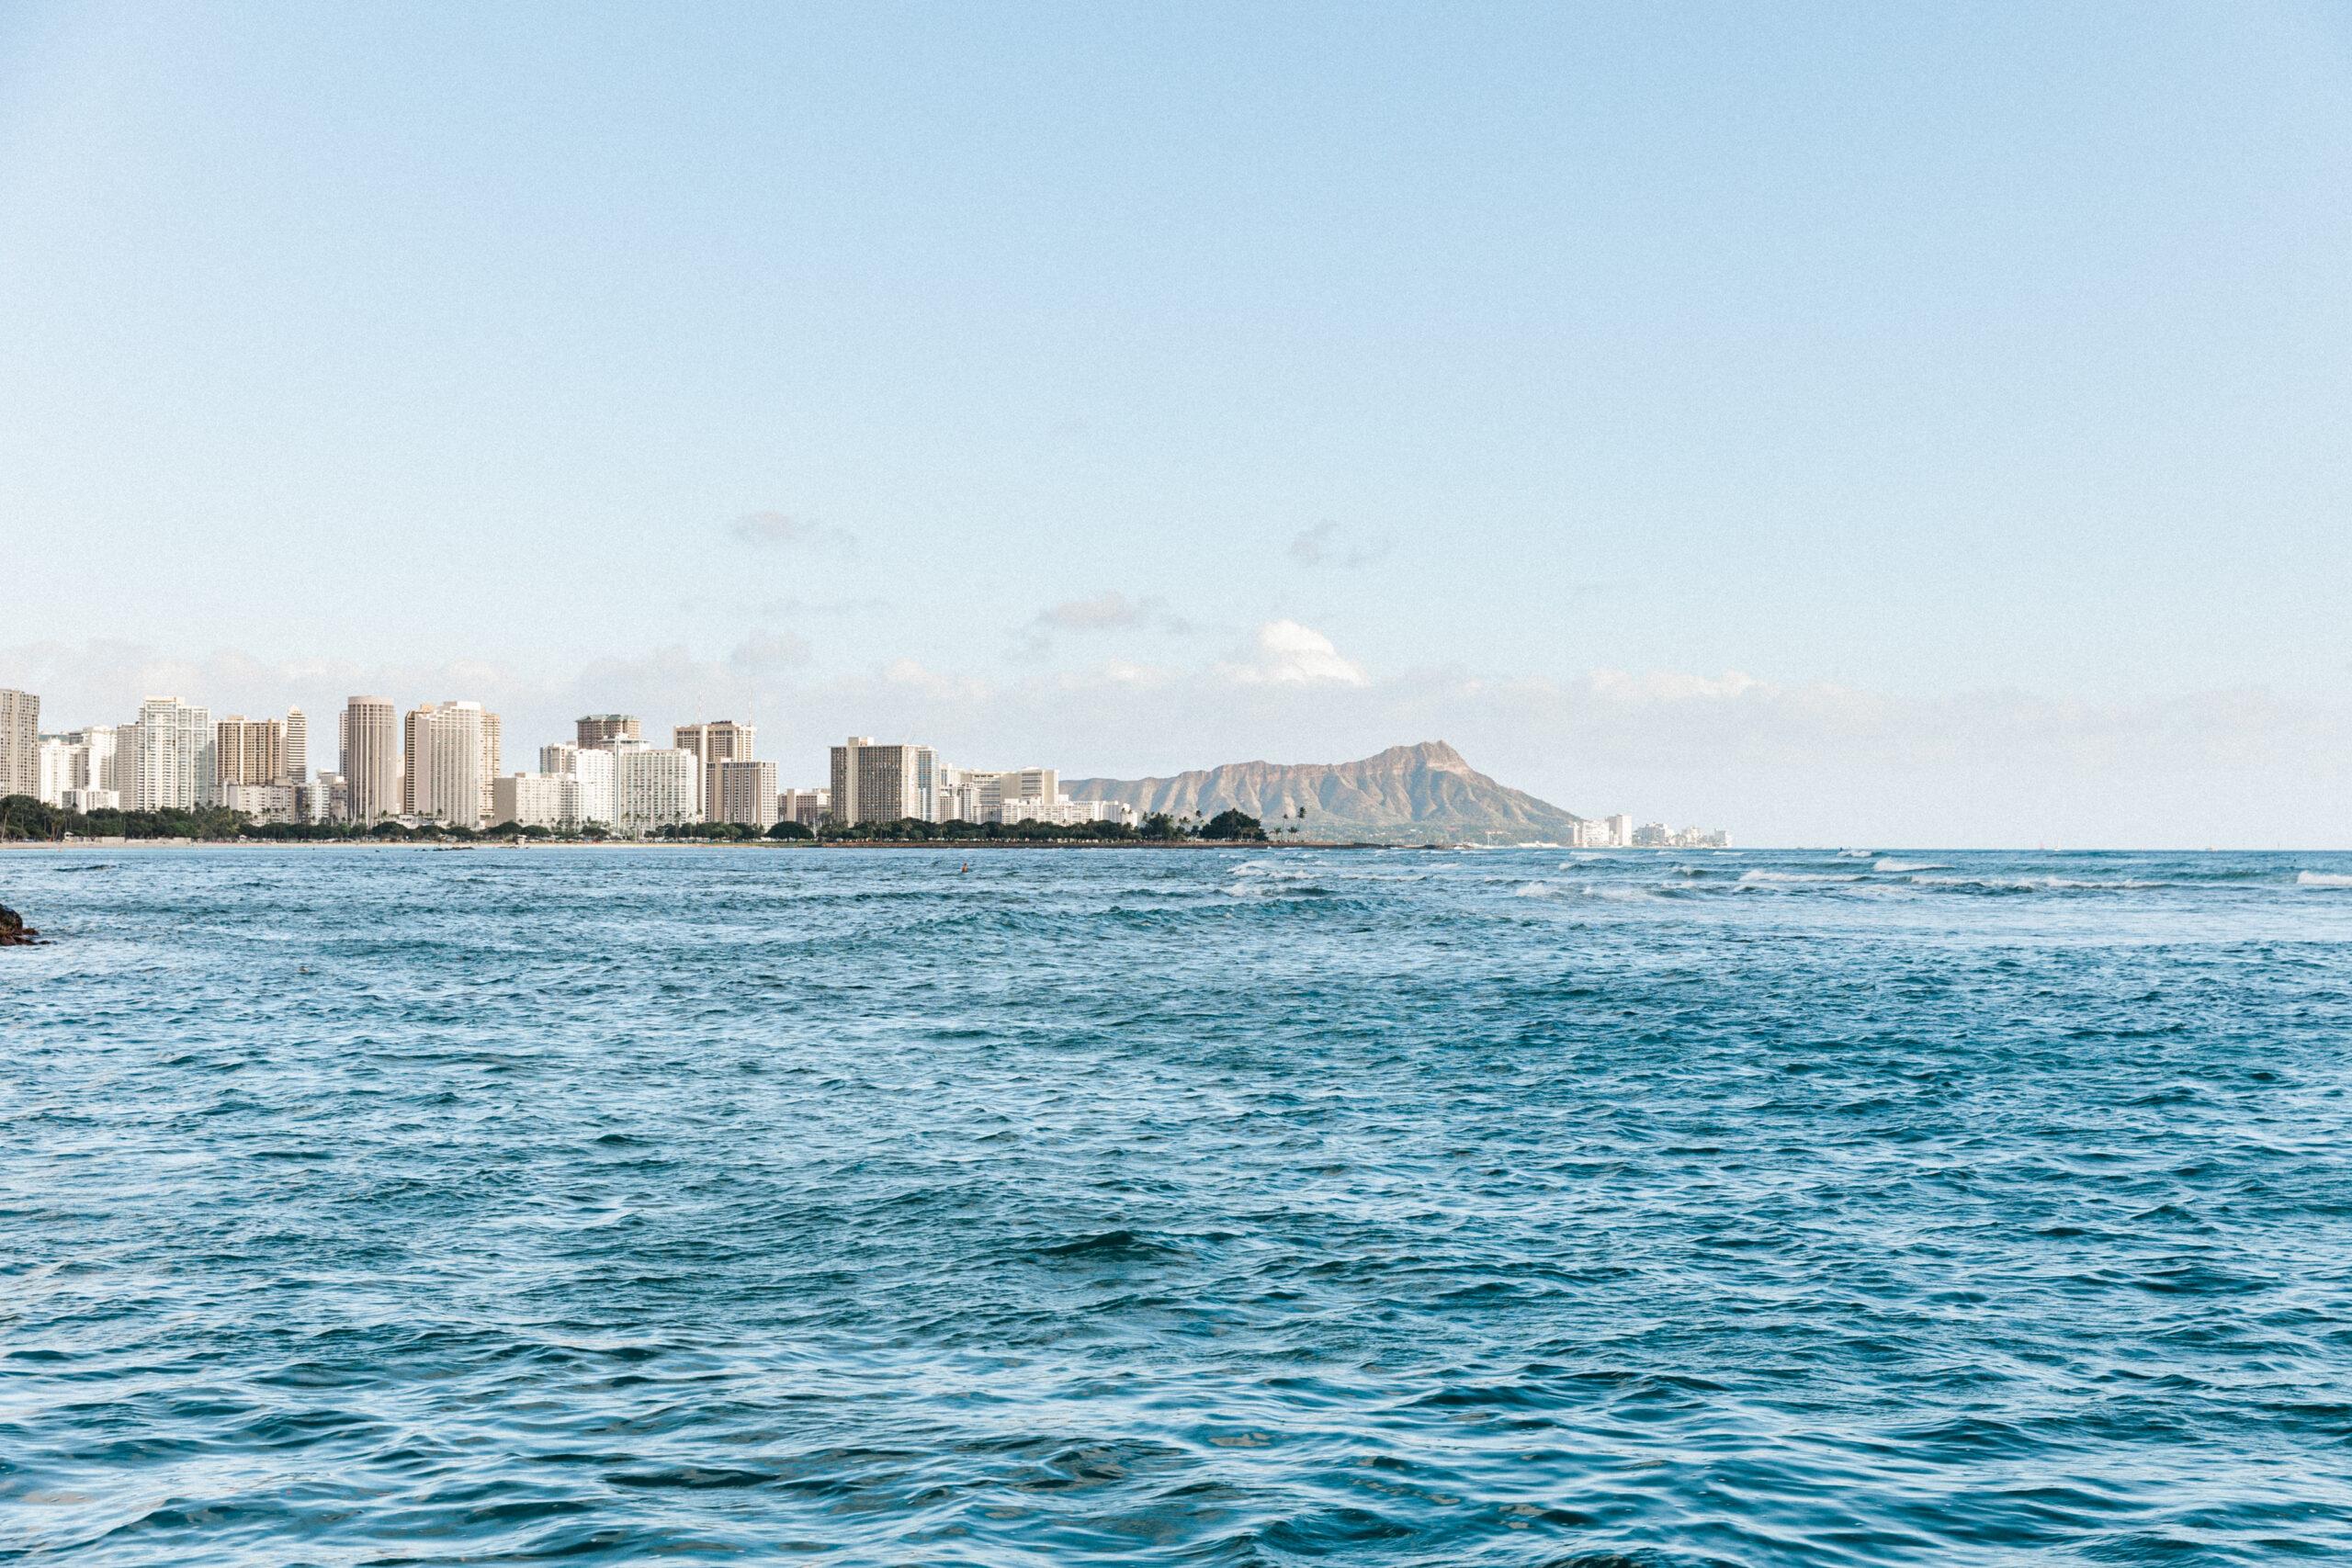 Our Experience on Tradewinds Catamaran - Considering booking an Oahu catamaran cruise in Honolulu? I'm sharing all the detail on Tradewinds Catamaran charter in Honolulu, Hawaii!   Oahu Catamaran Cruise - Catamaran Waikiki - Catamaran Honolulu